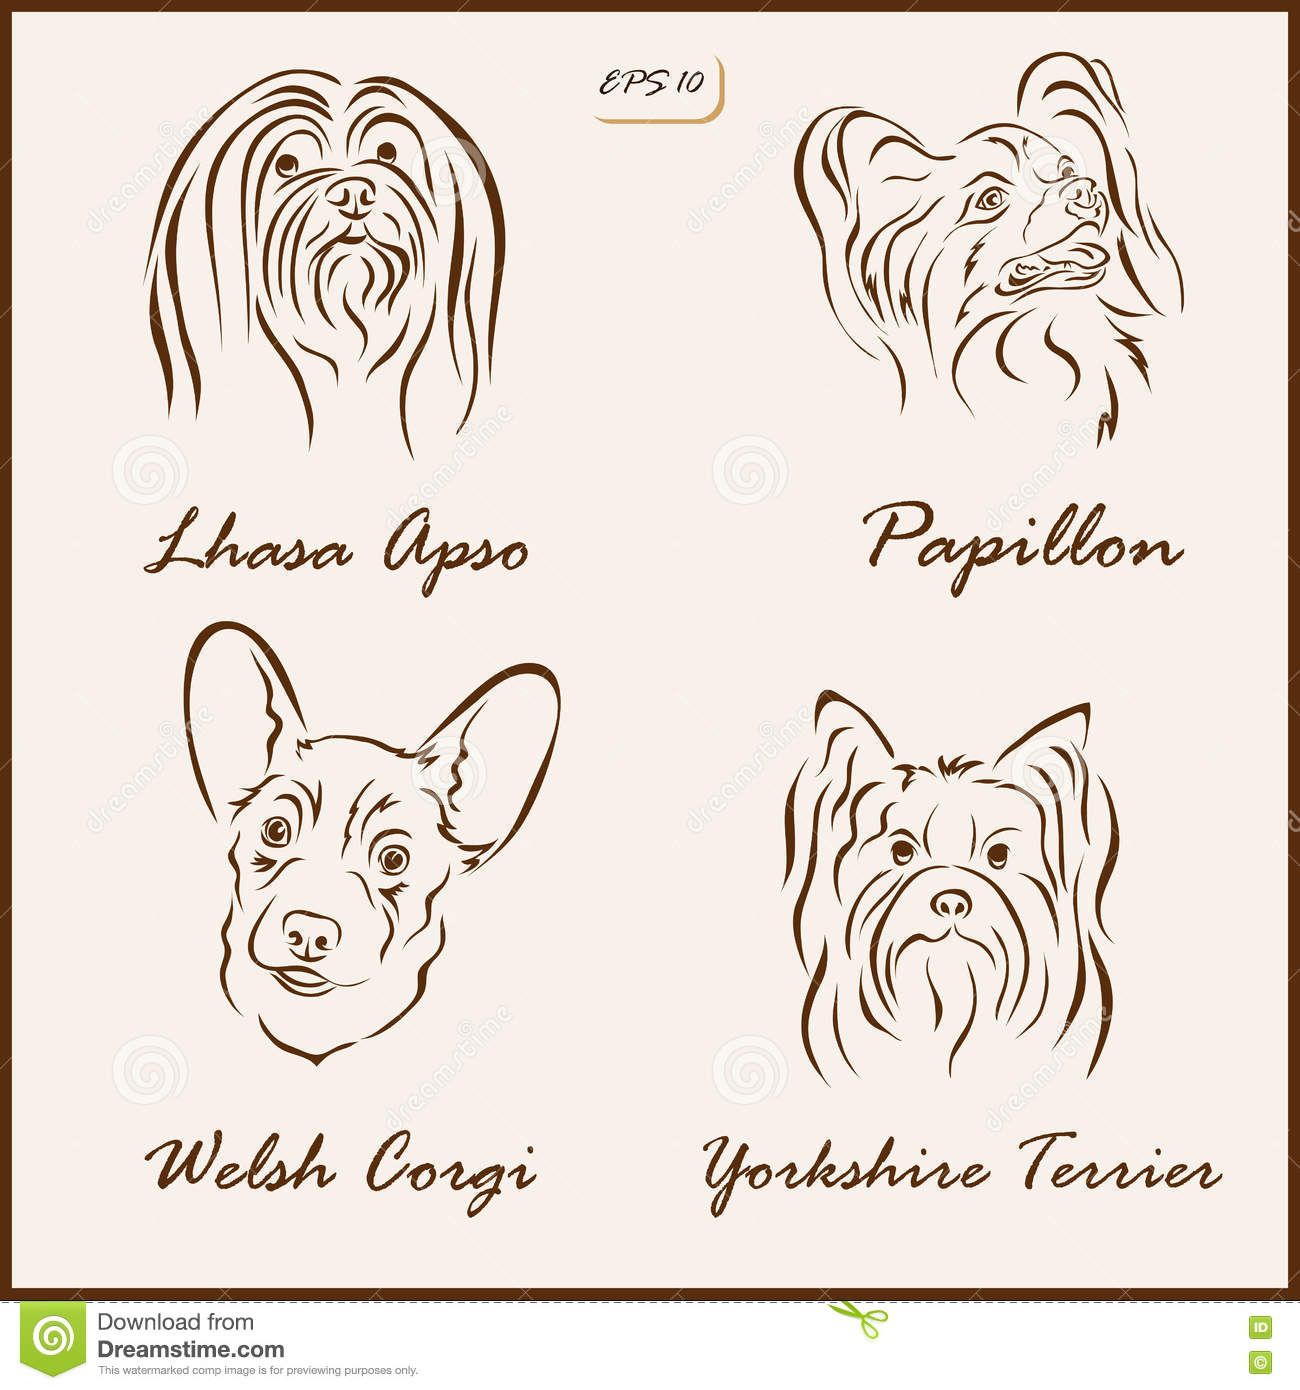 Dog Breeds Set Vector Illustration Shows Lhasa Apso Papillon Welsh Corgi Yorkshire Terrier 73540535 Jpg 1300 Papillon Dog Yorkshire Terrier Animal Silhouette [ 1390 x 1300 Pixel ]